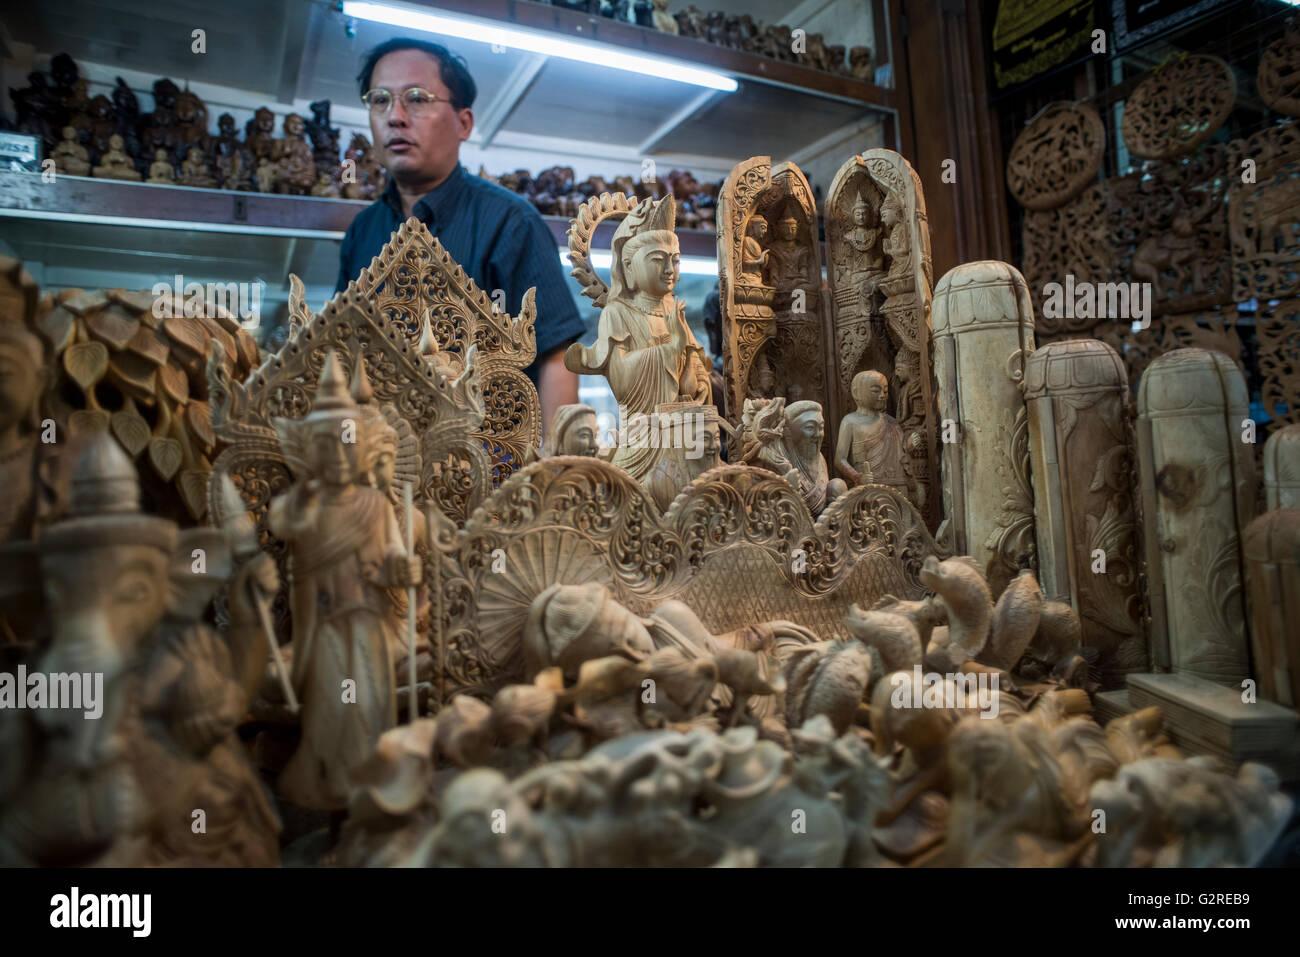 Souvenirs vendor wood carvings stock photos